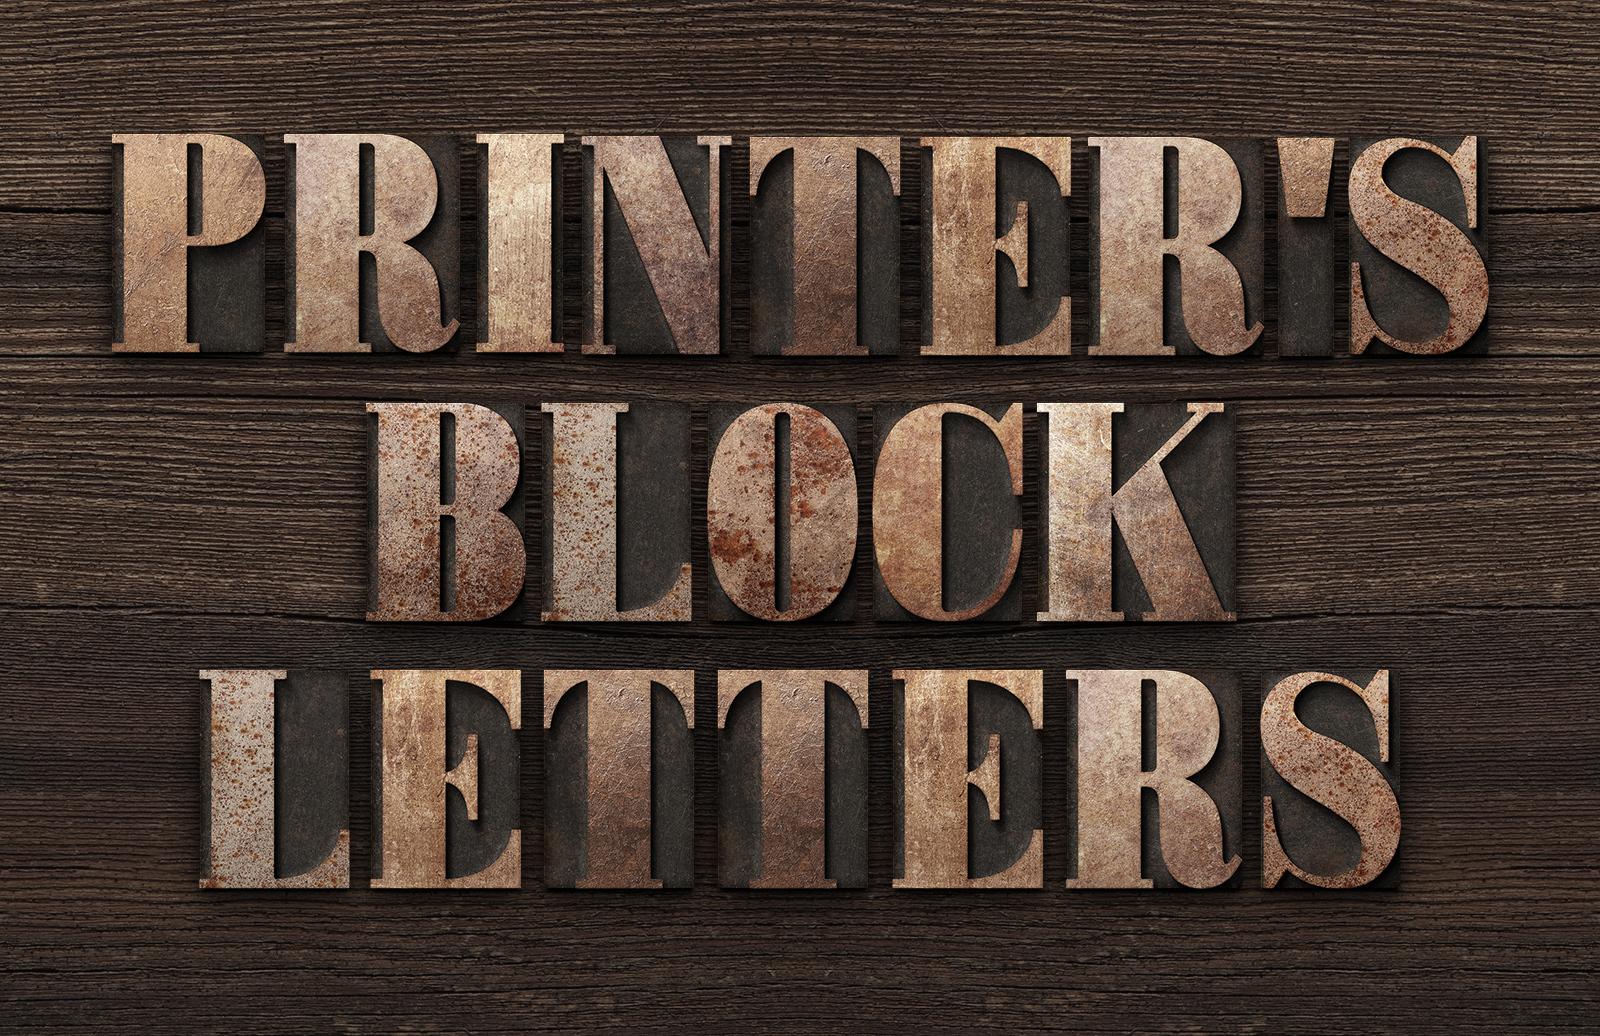 Printers Letterpress Block Letters Preview 1